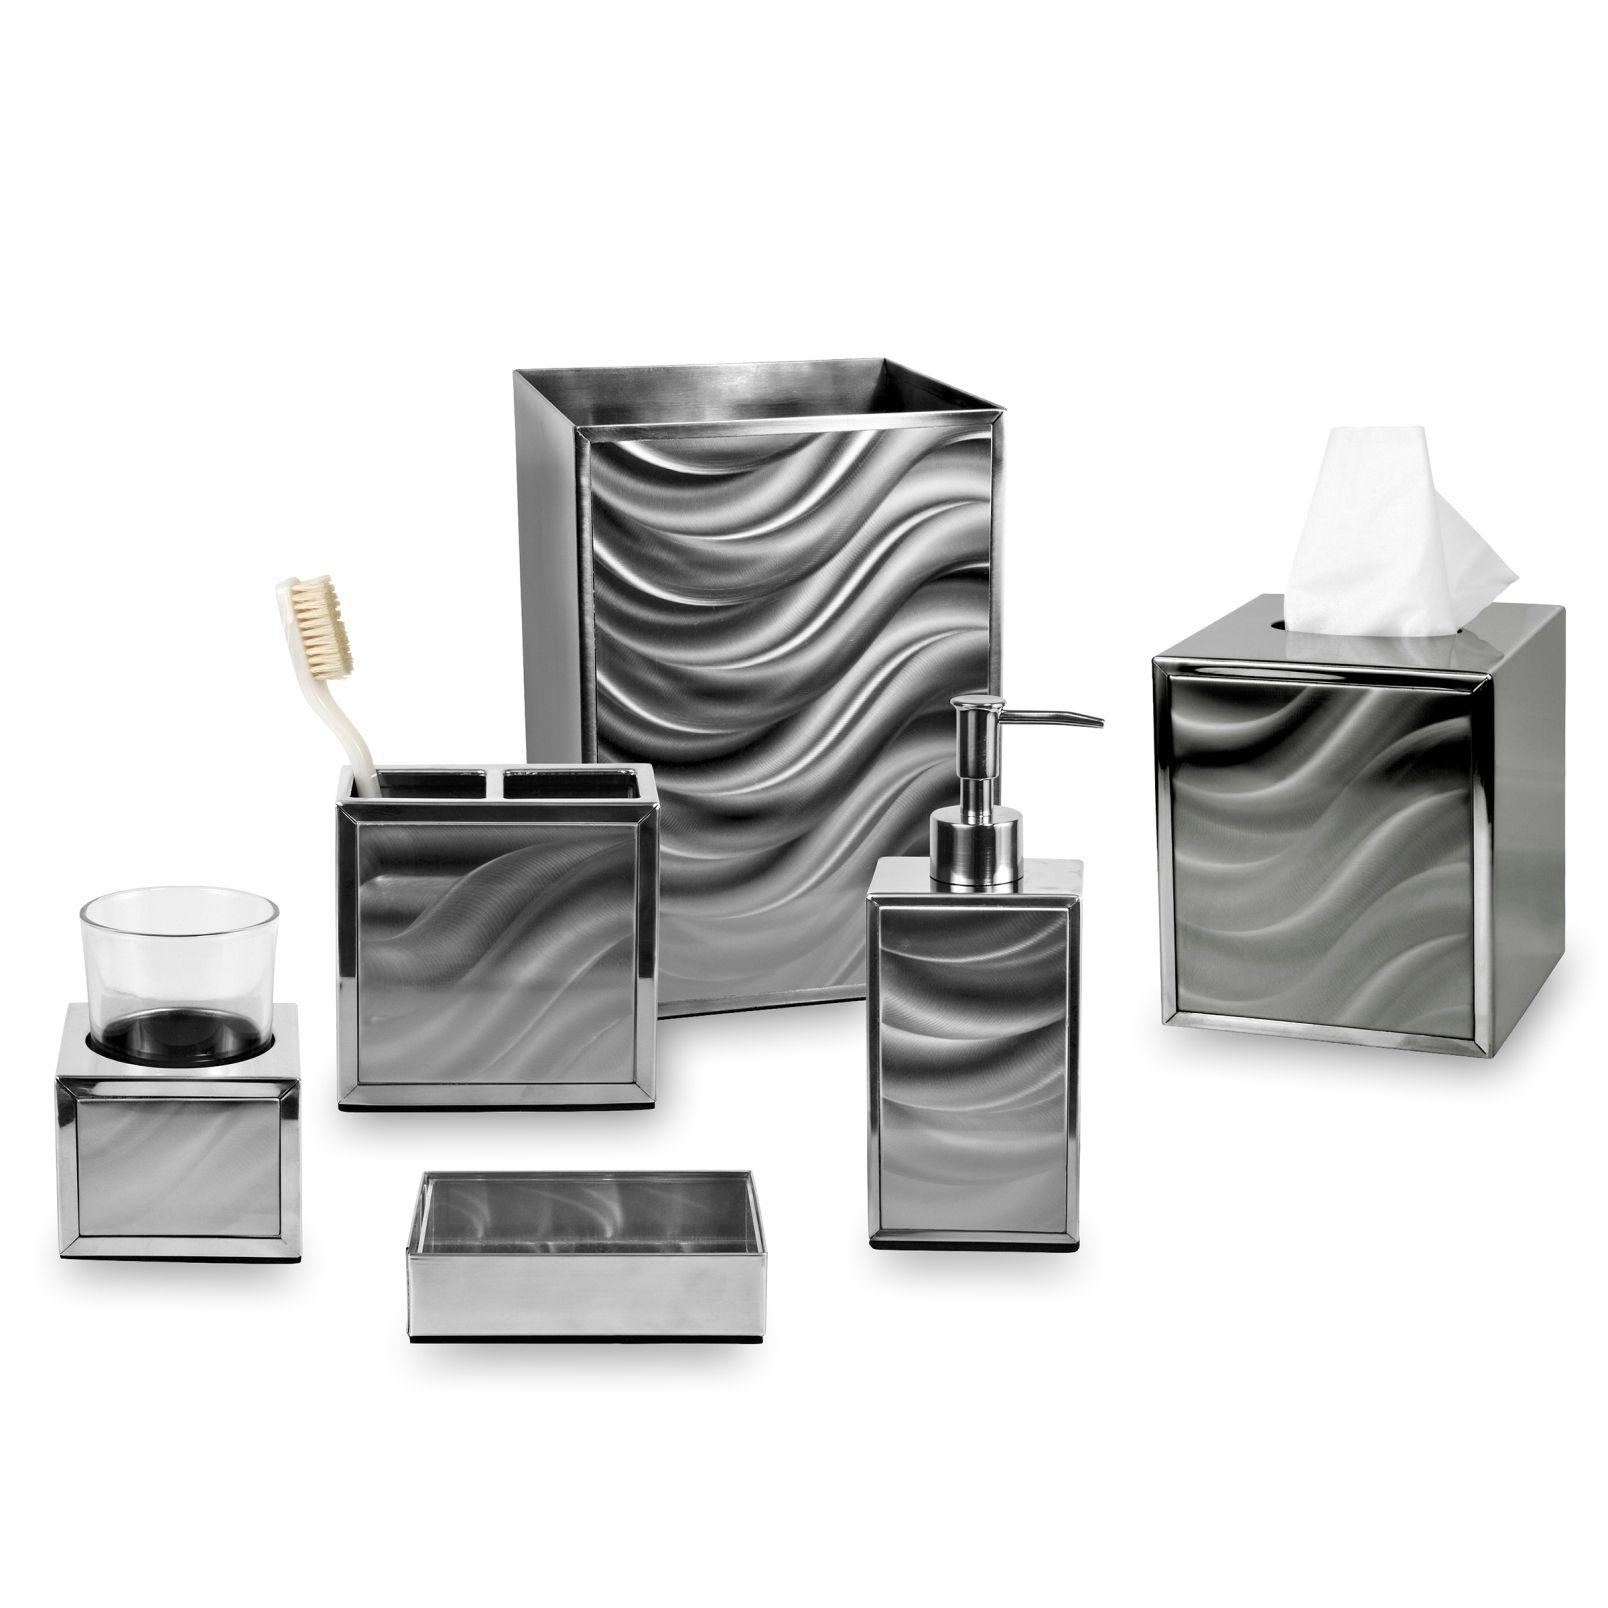 Elegantes badezimmerdekor moire bath collection  products  pinterest